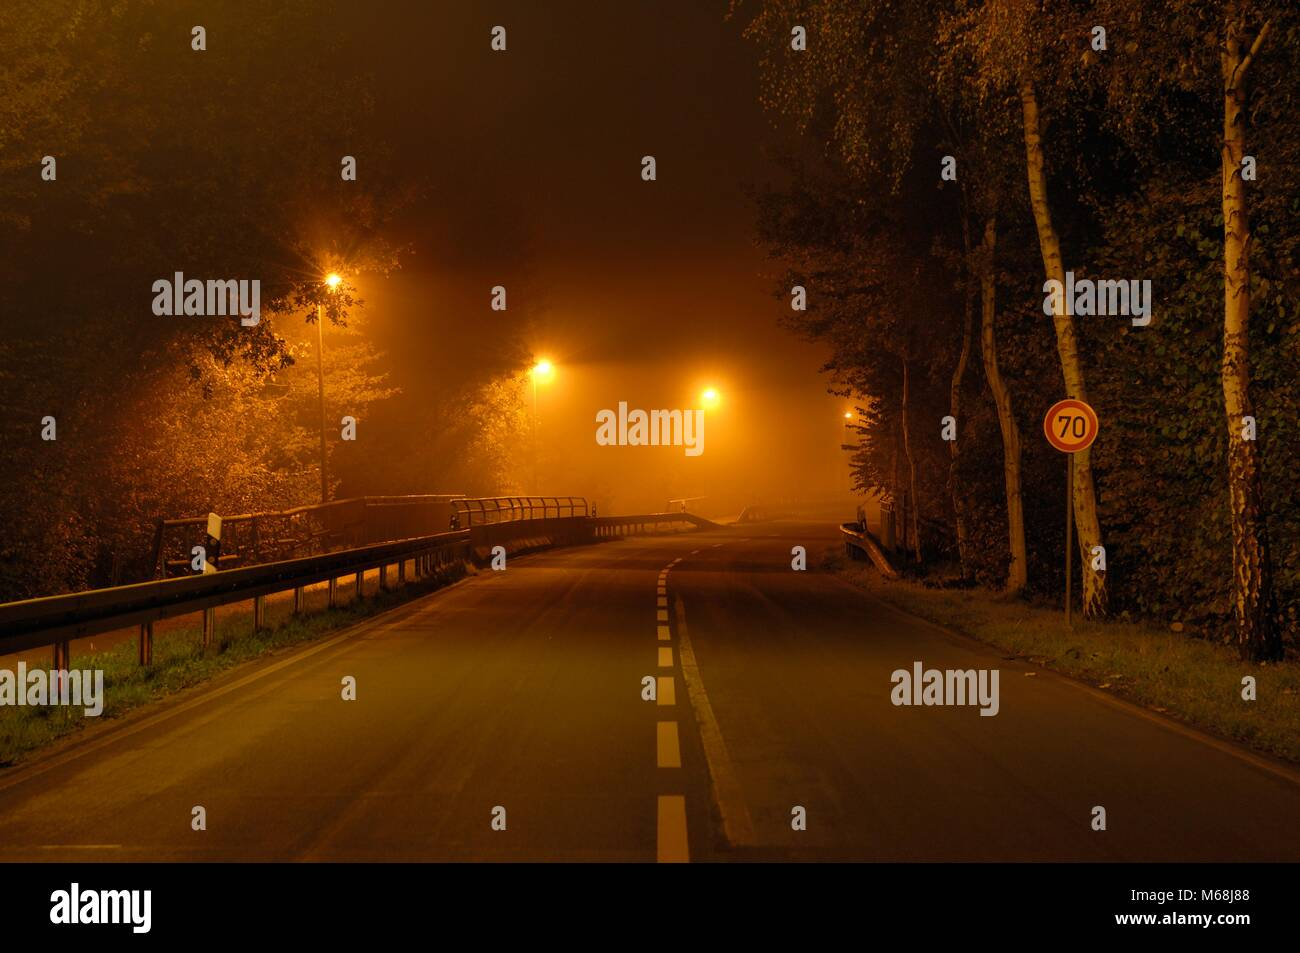 Landstrasse im Nebel Stock Photo